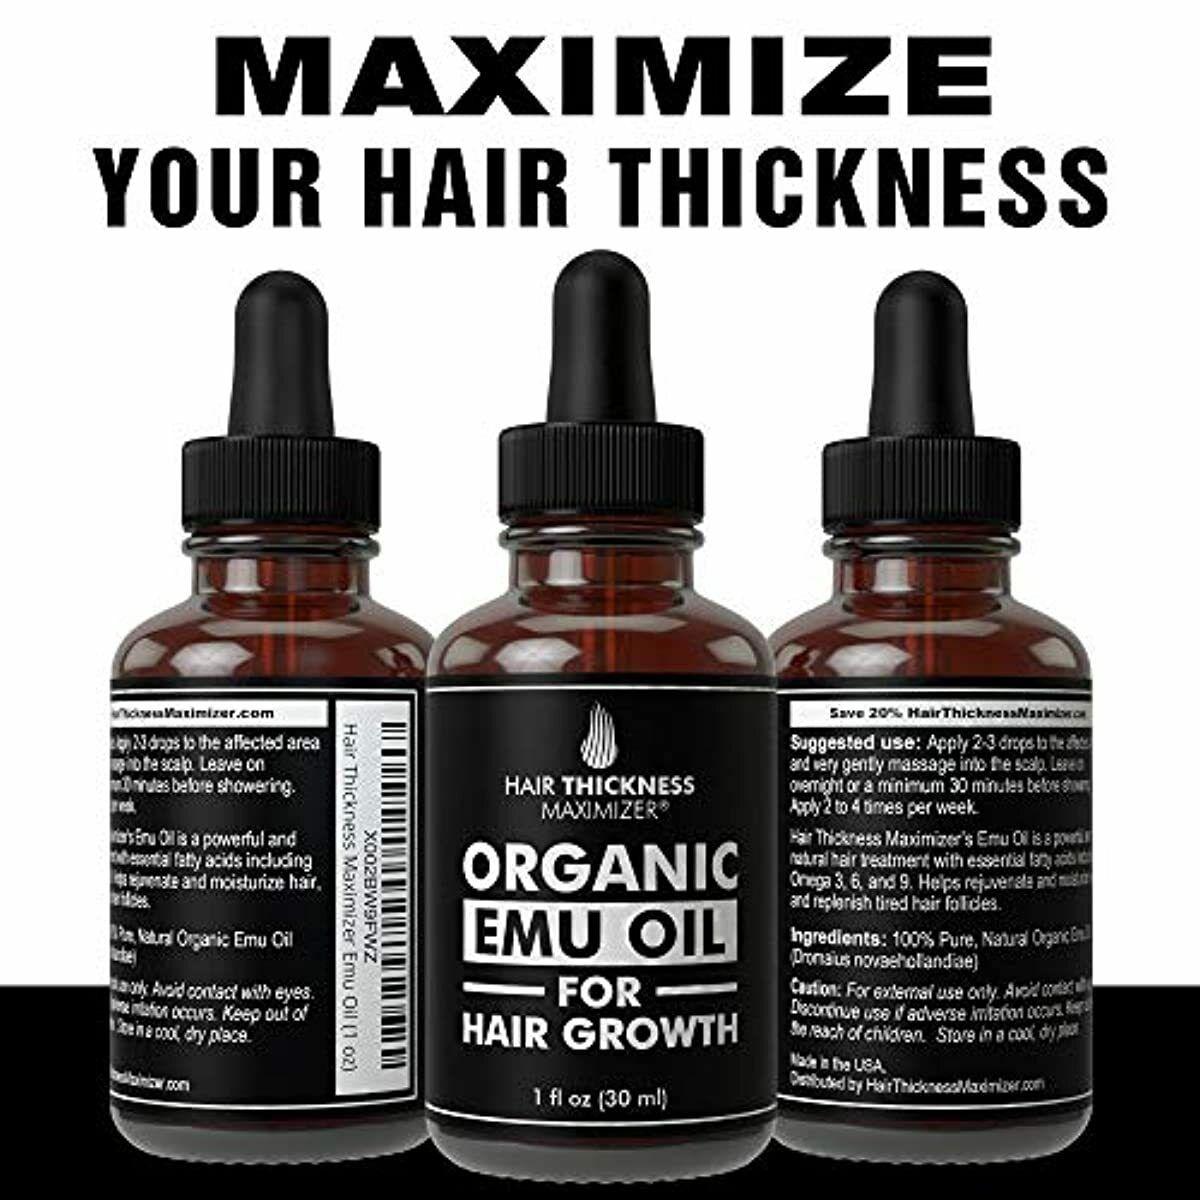 EMU Oil For Hair Growth Hair Thickness Maximizer Best Organi